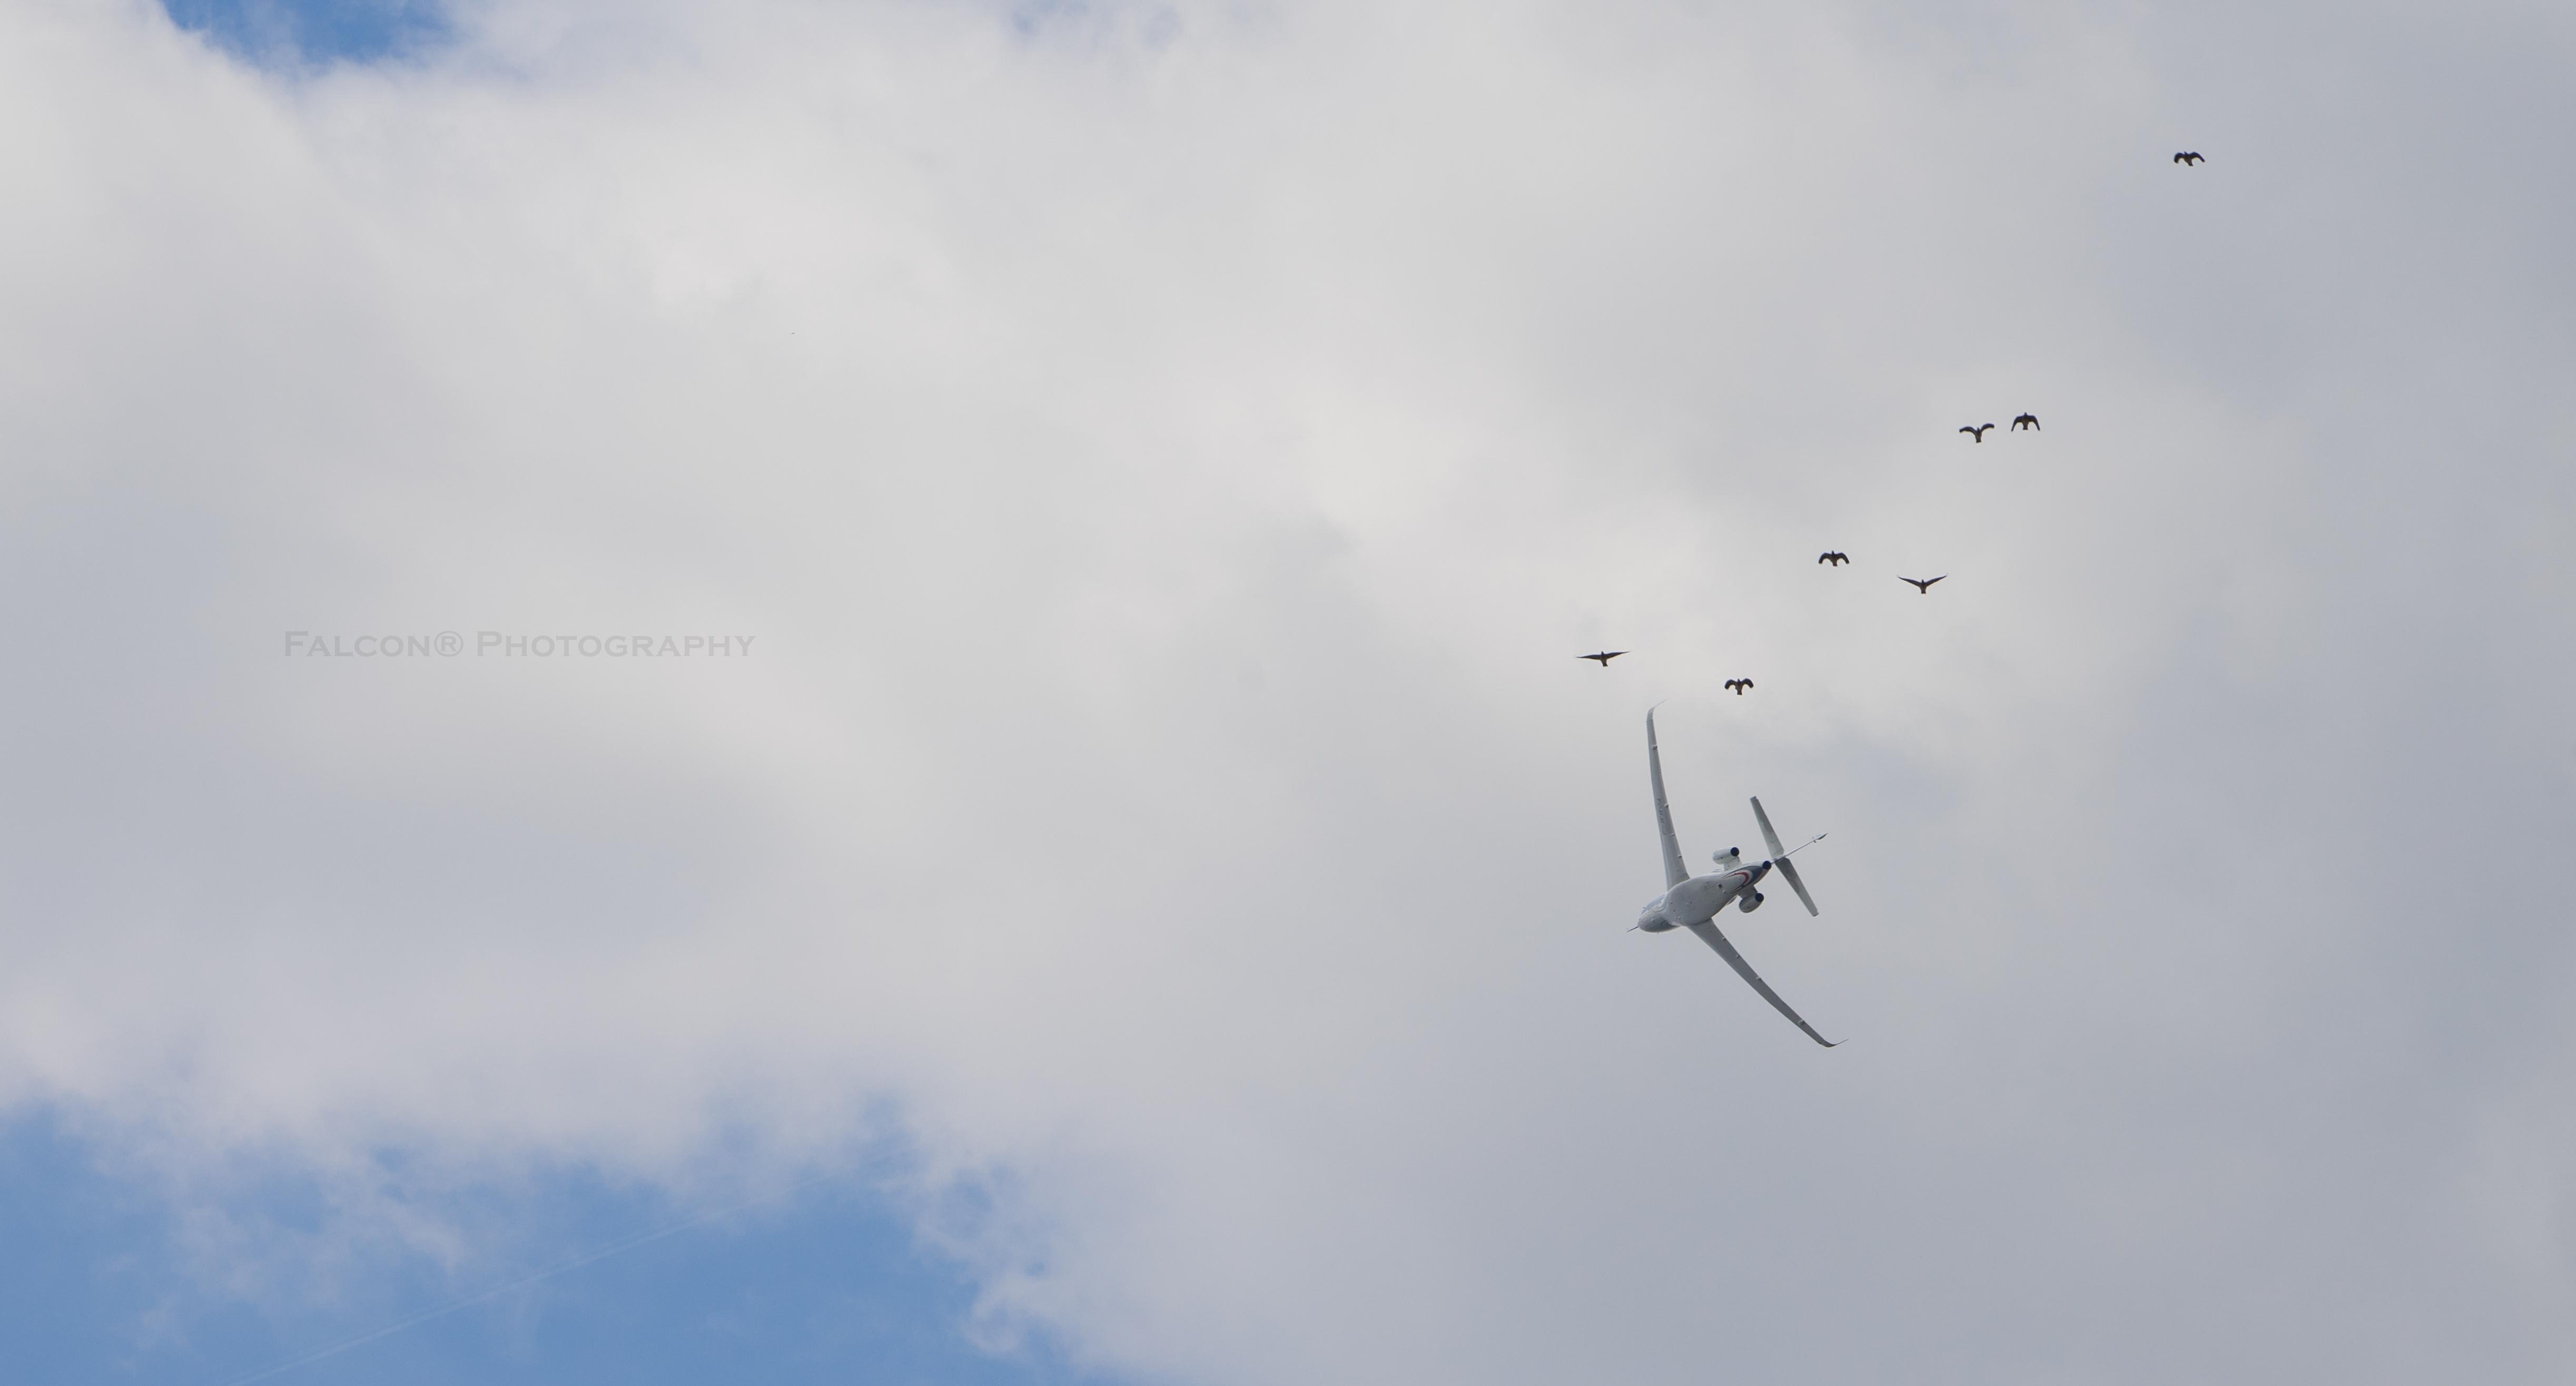 New Dassault Falcon URL 8X Air Show